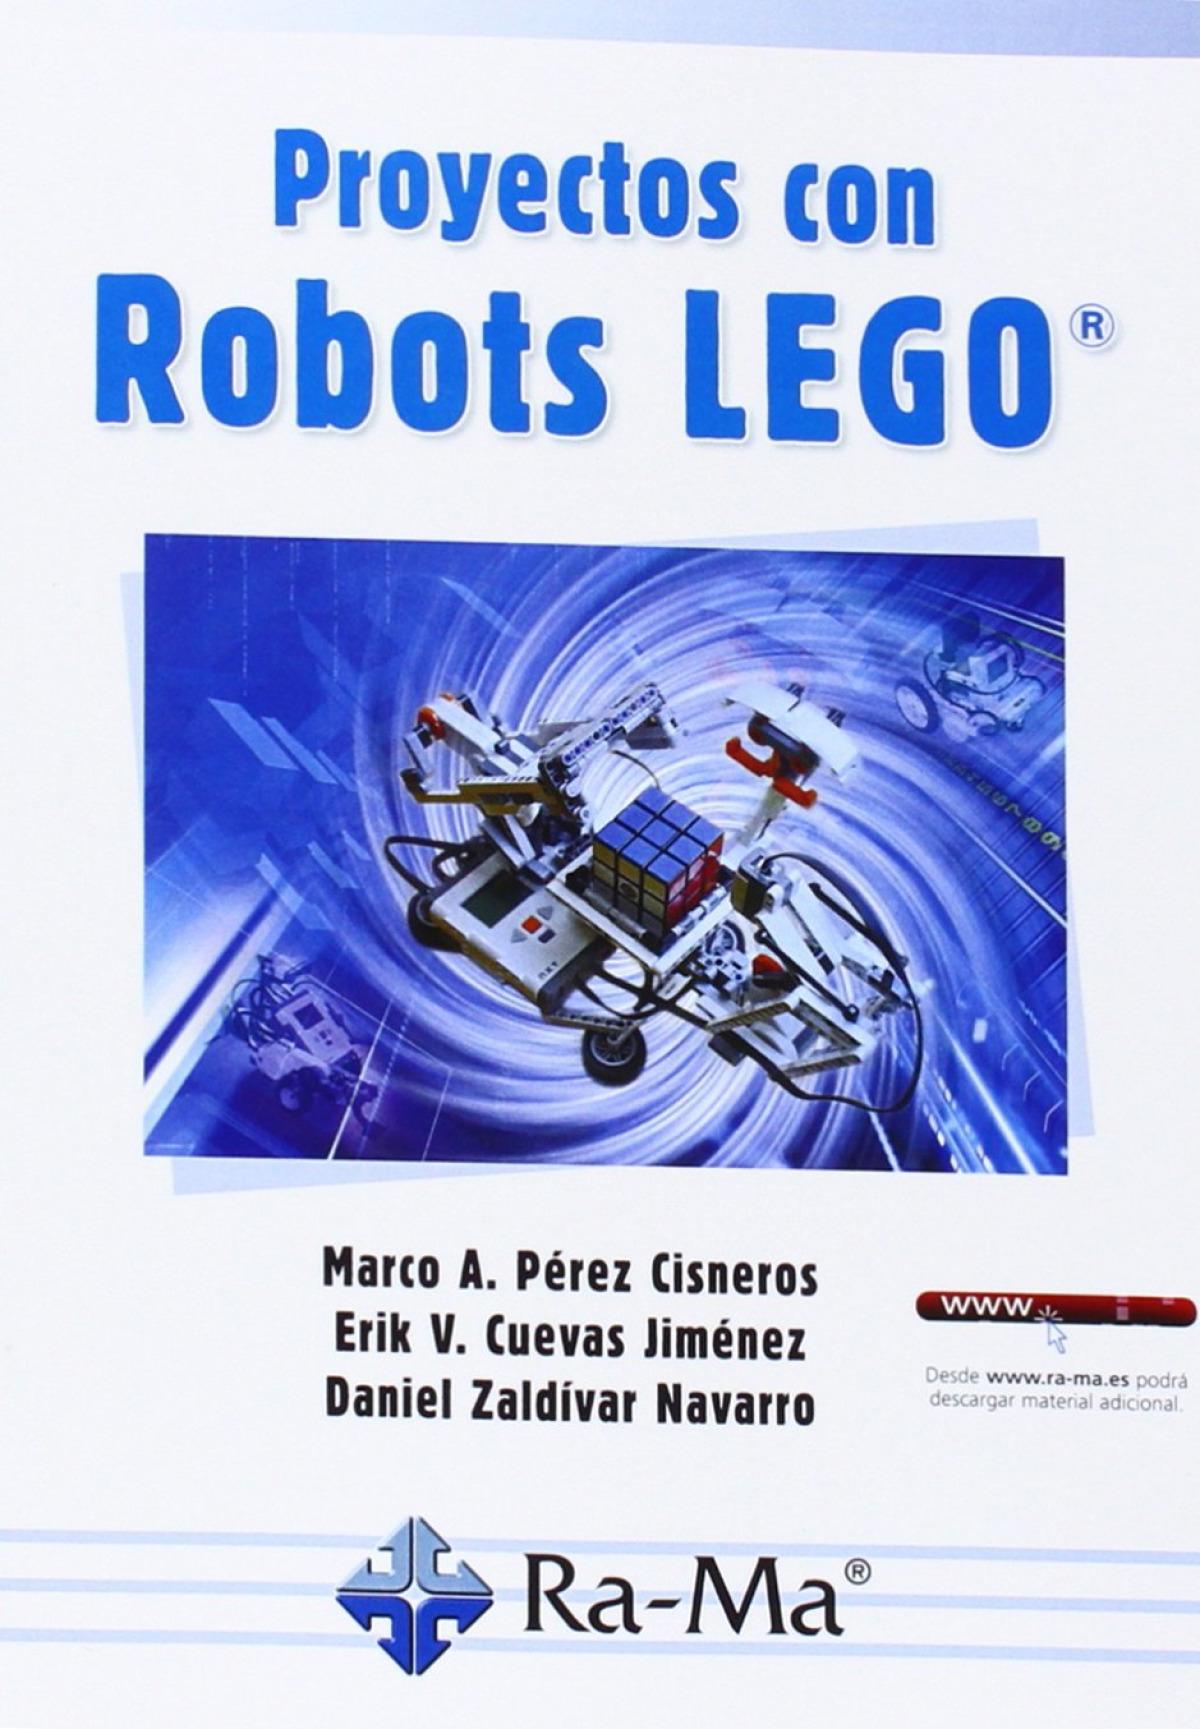 PROYECTOS CON ROBOTS LEGO 9788499645056